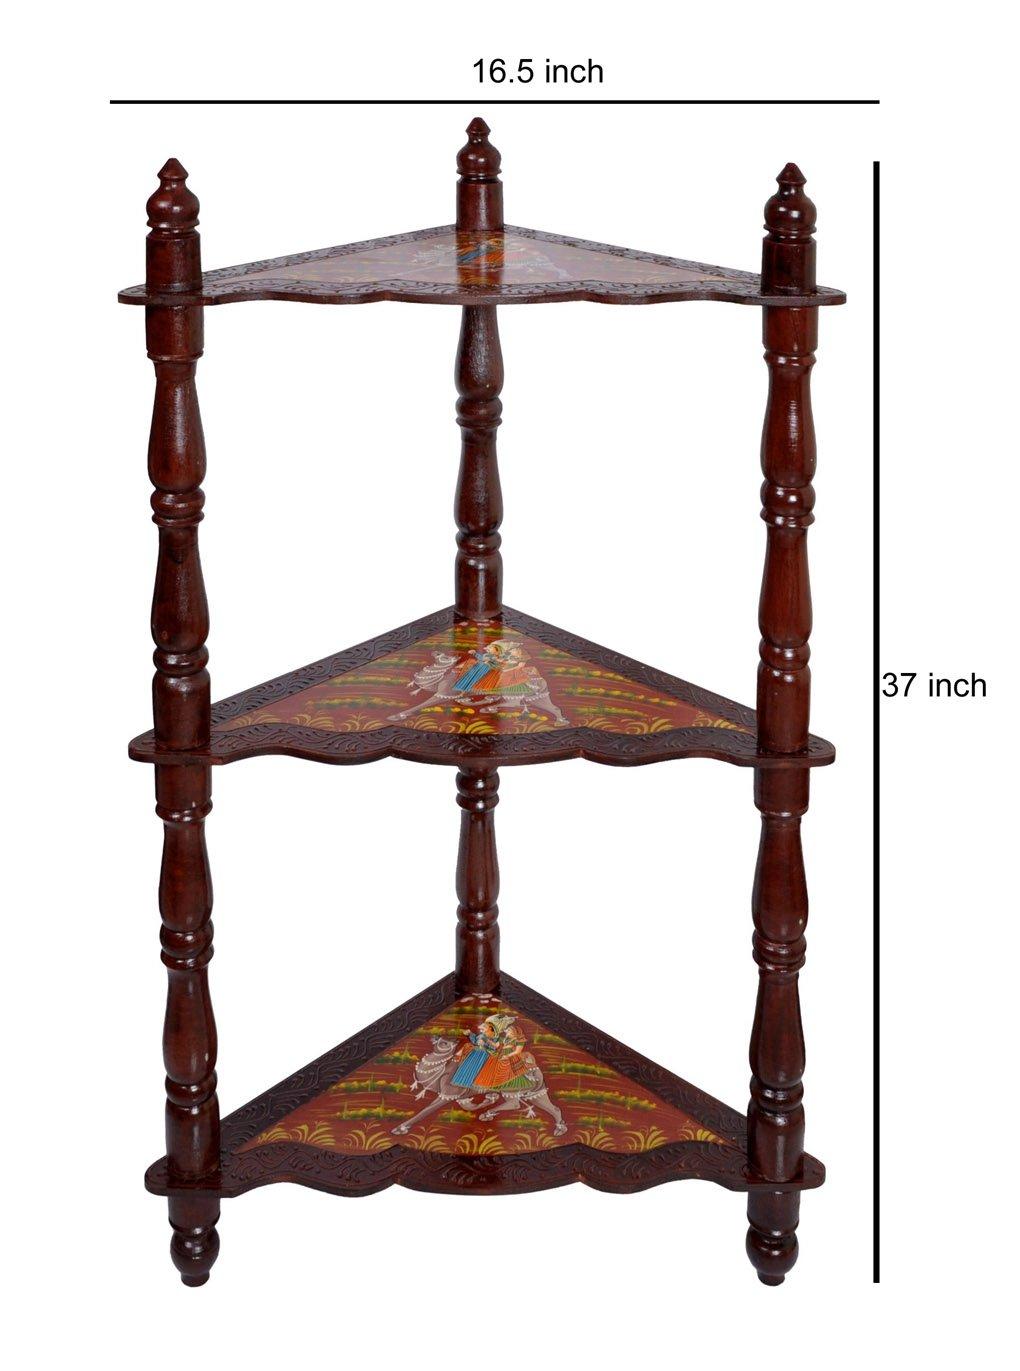 Wooden Brown Corner Shelf & Corner Bookcase / Standing Shelf Units 37 x 16.5 x 16.5 Inch by Lalhaveli